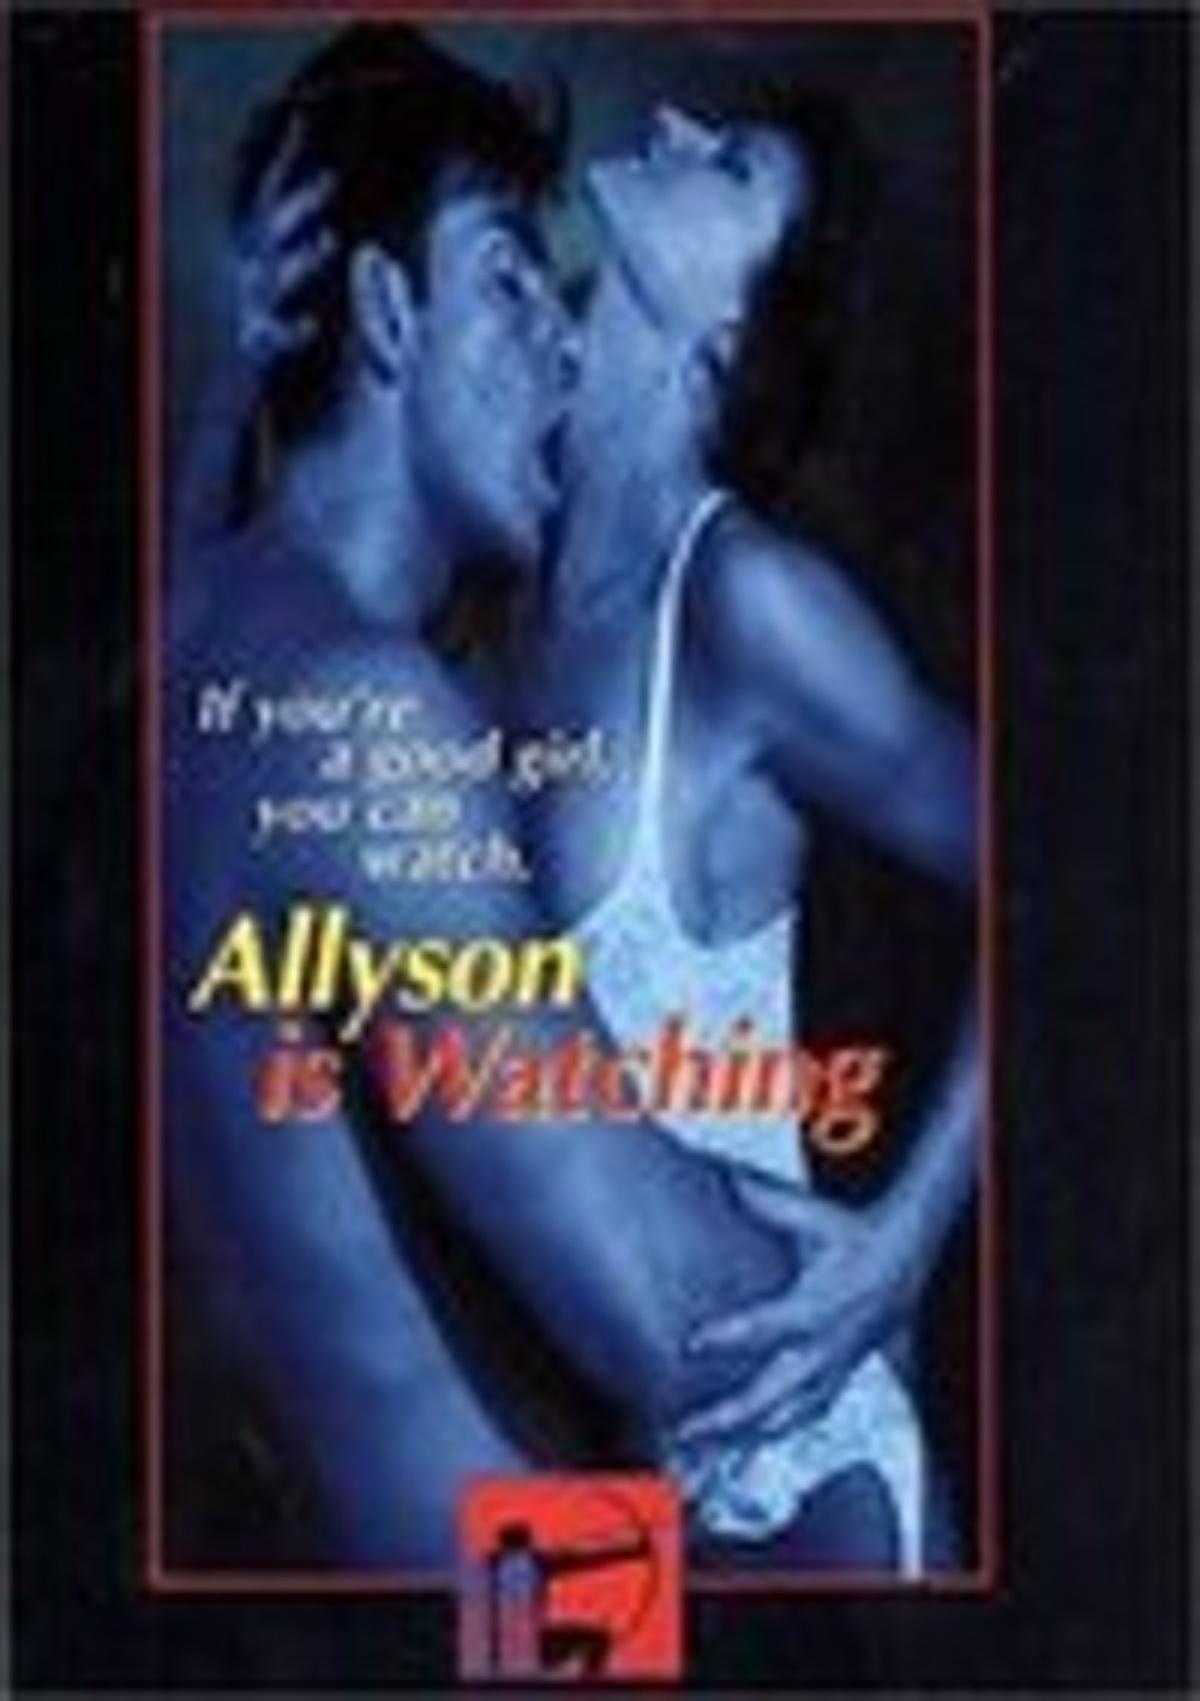 Allyson Is Watching 1997 allyson is watching - vpro cinema - vpro